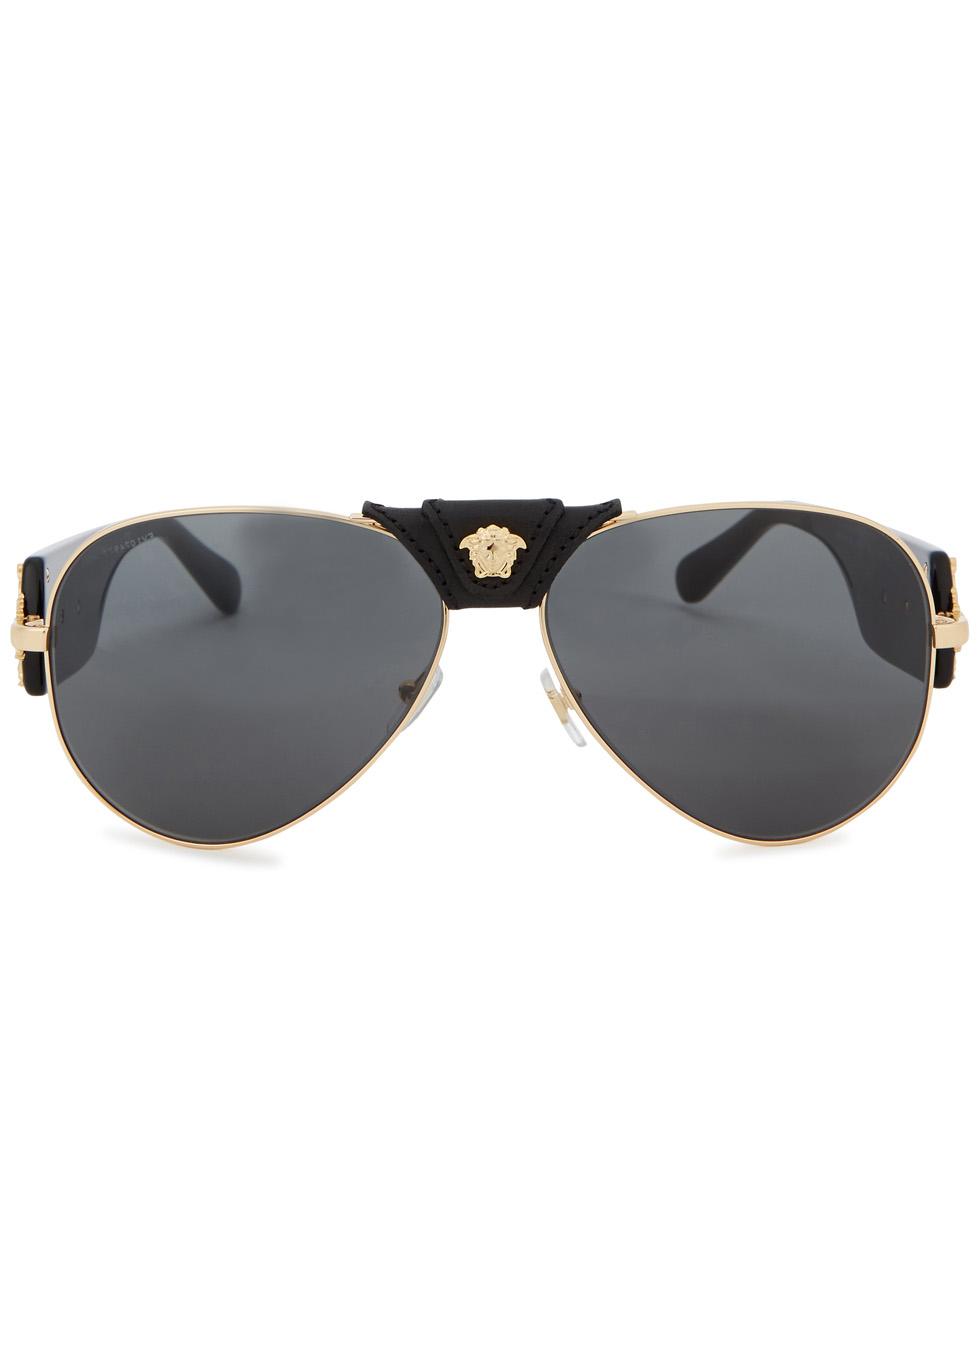 Gold-tone aviator-style sunglasses - Versace